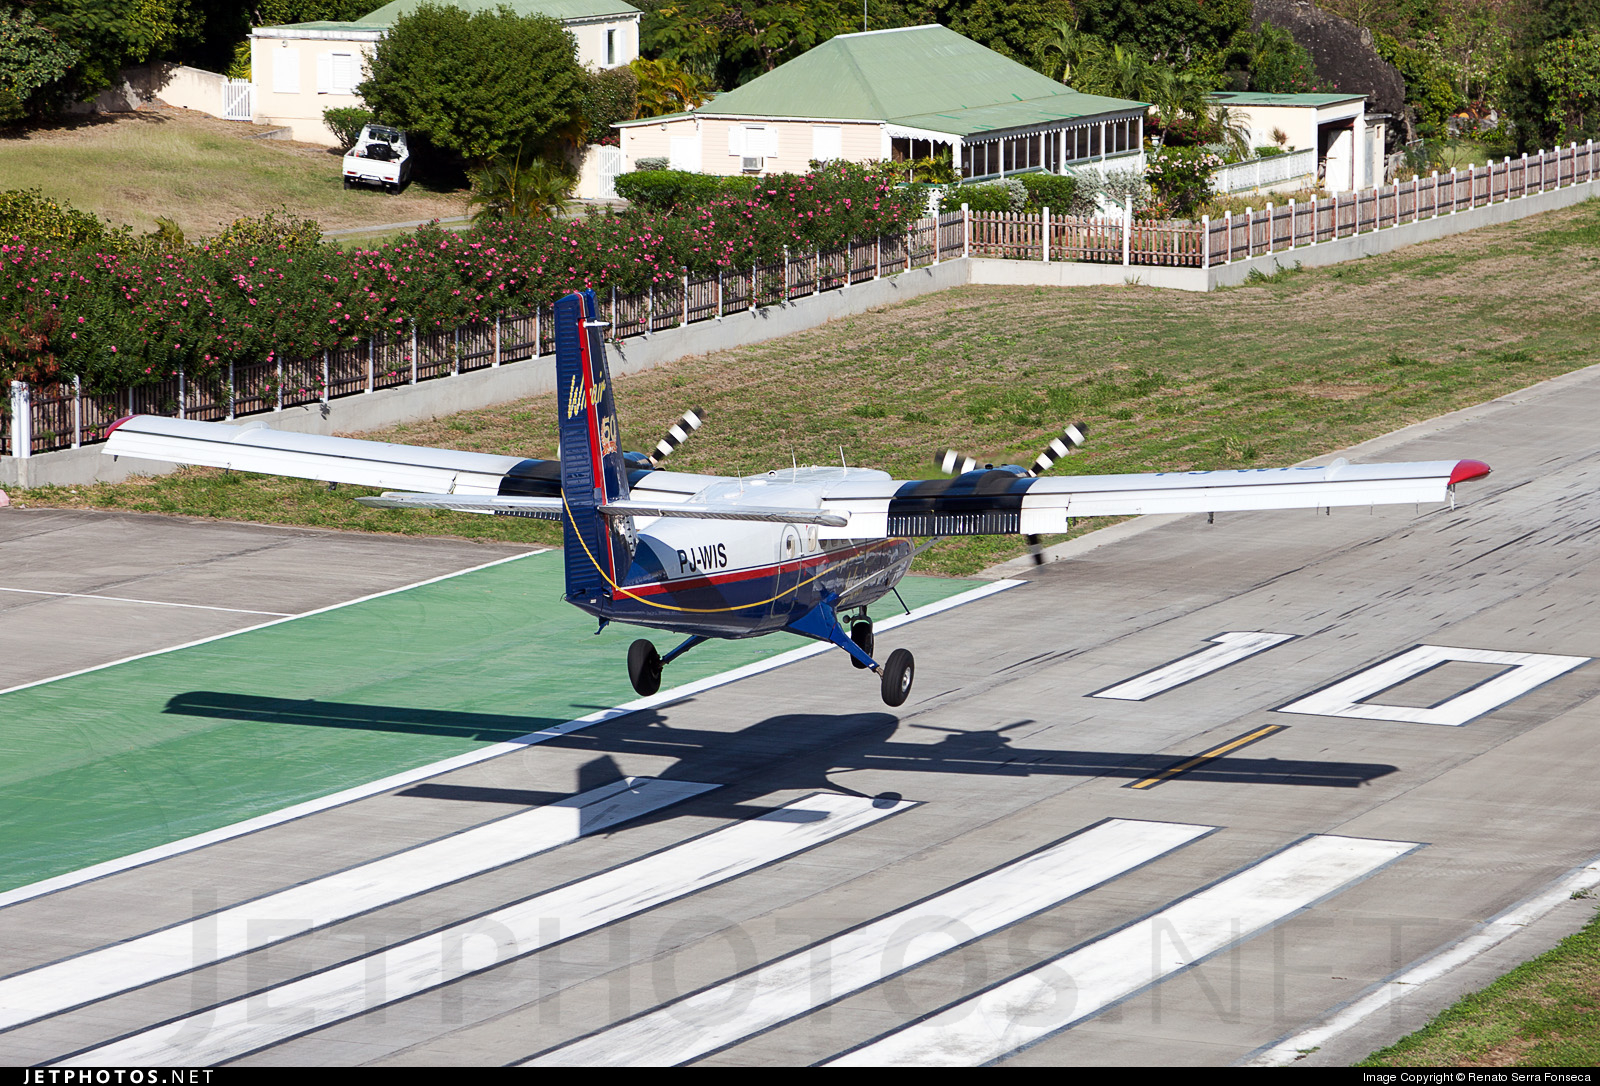 PJ-WIS - De Havilland Canada DHC-6-300 Twin Otter - Winair - Windward Islands Airways